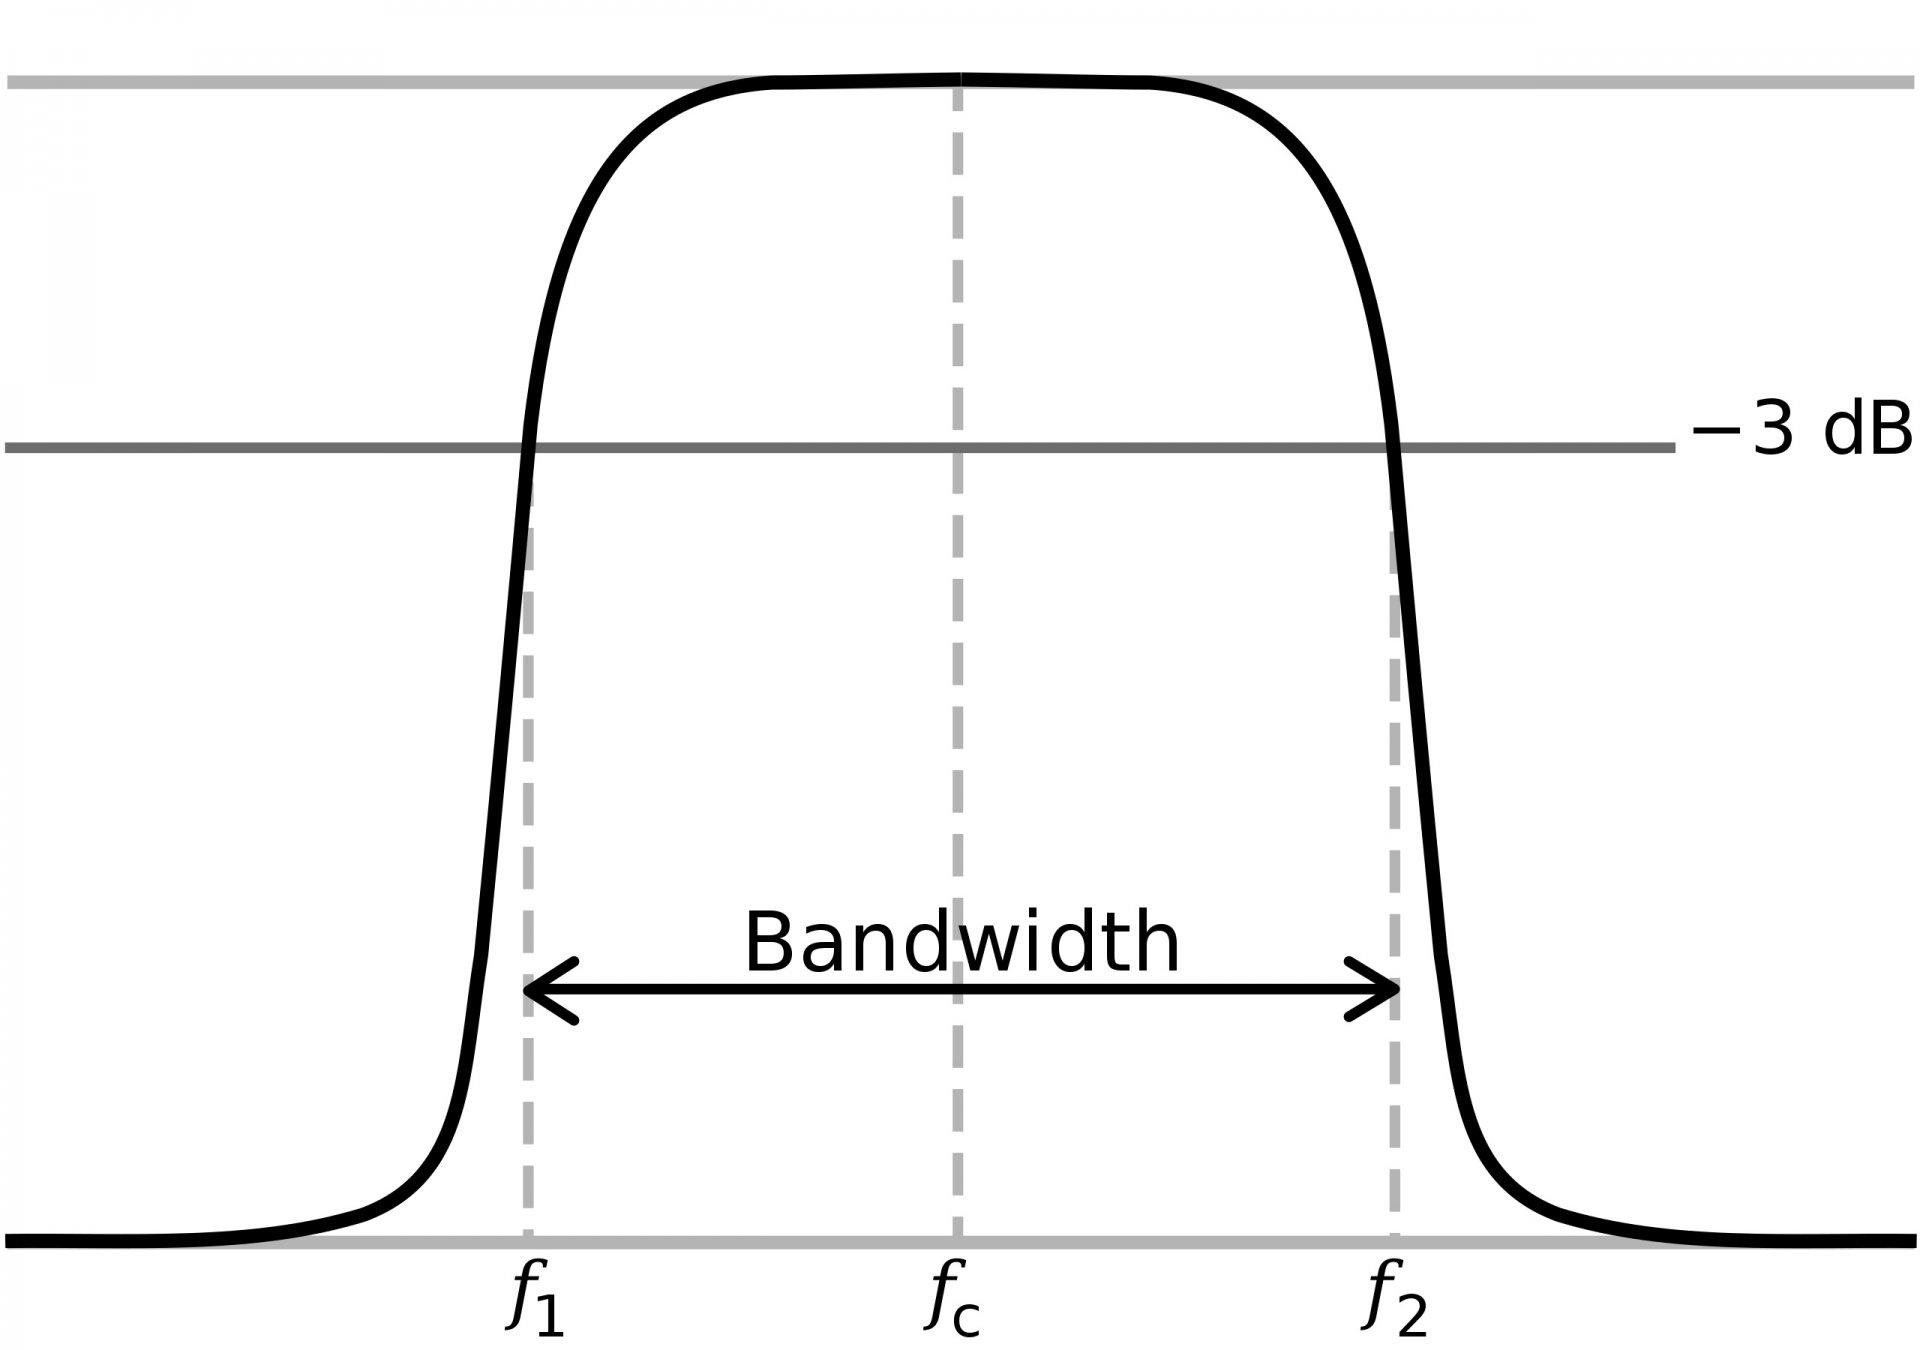 2560px-Bandwidth.svg.jpg